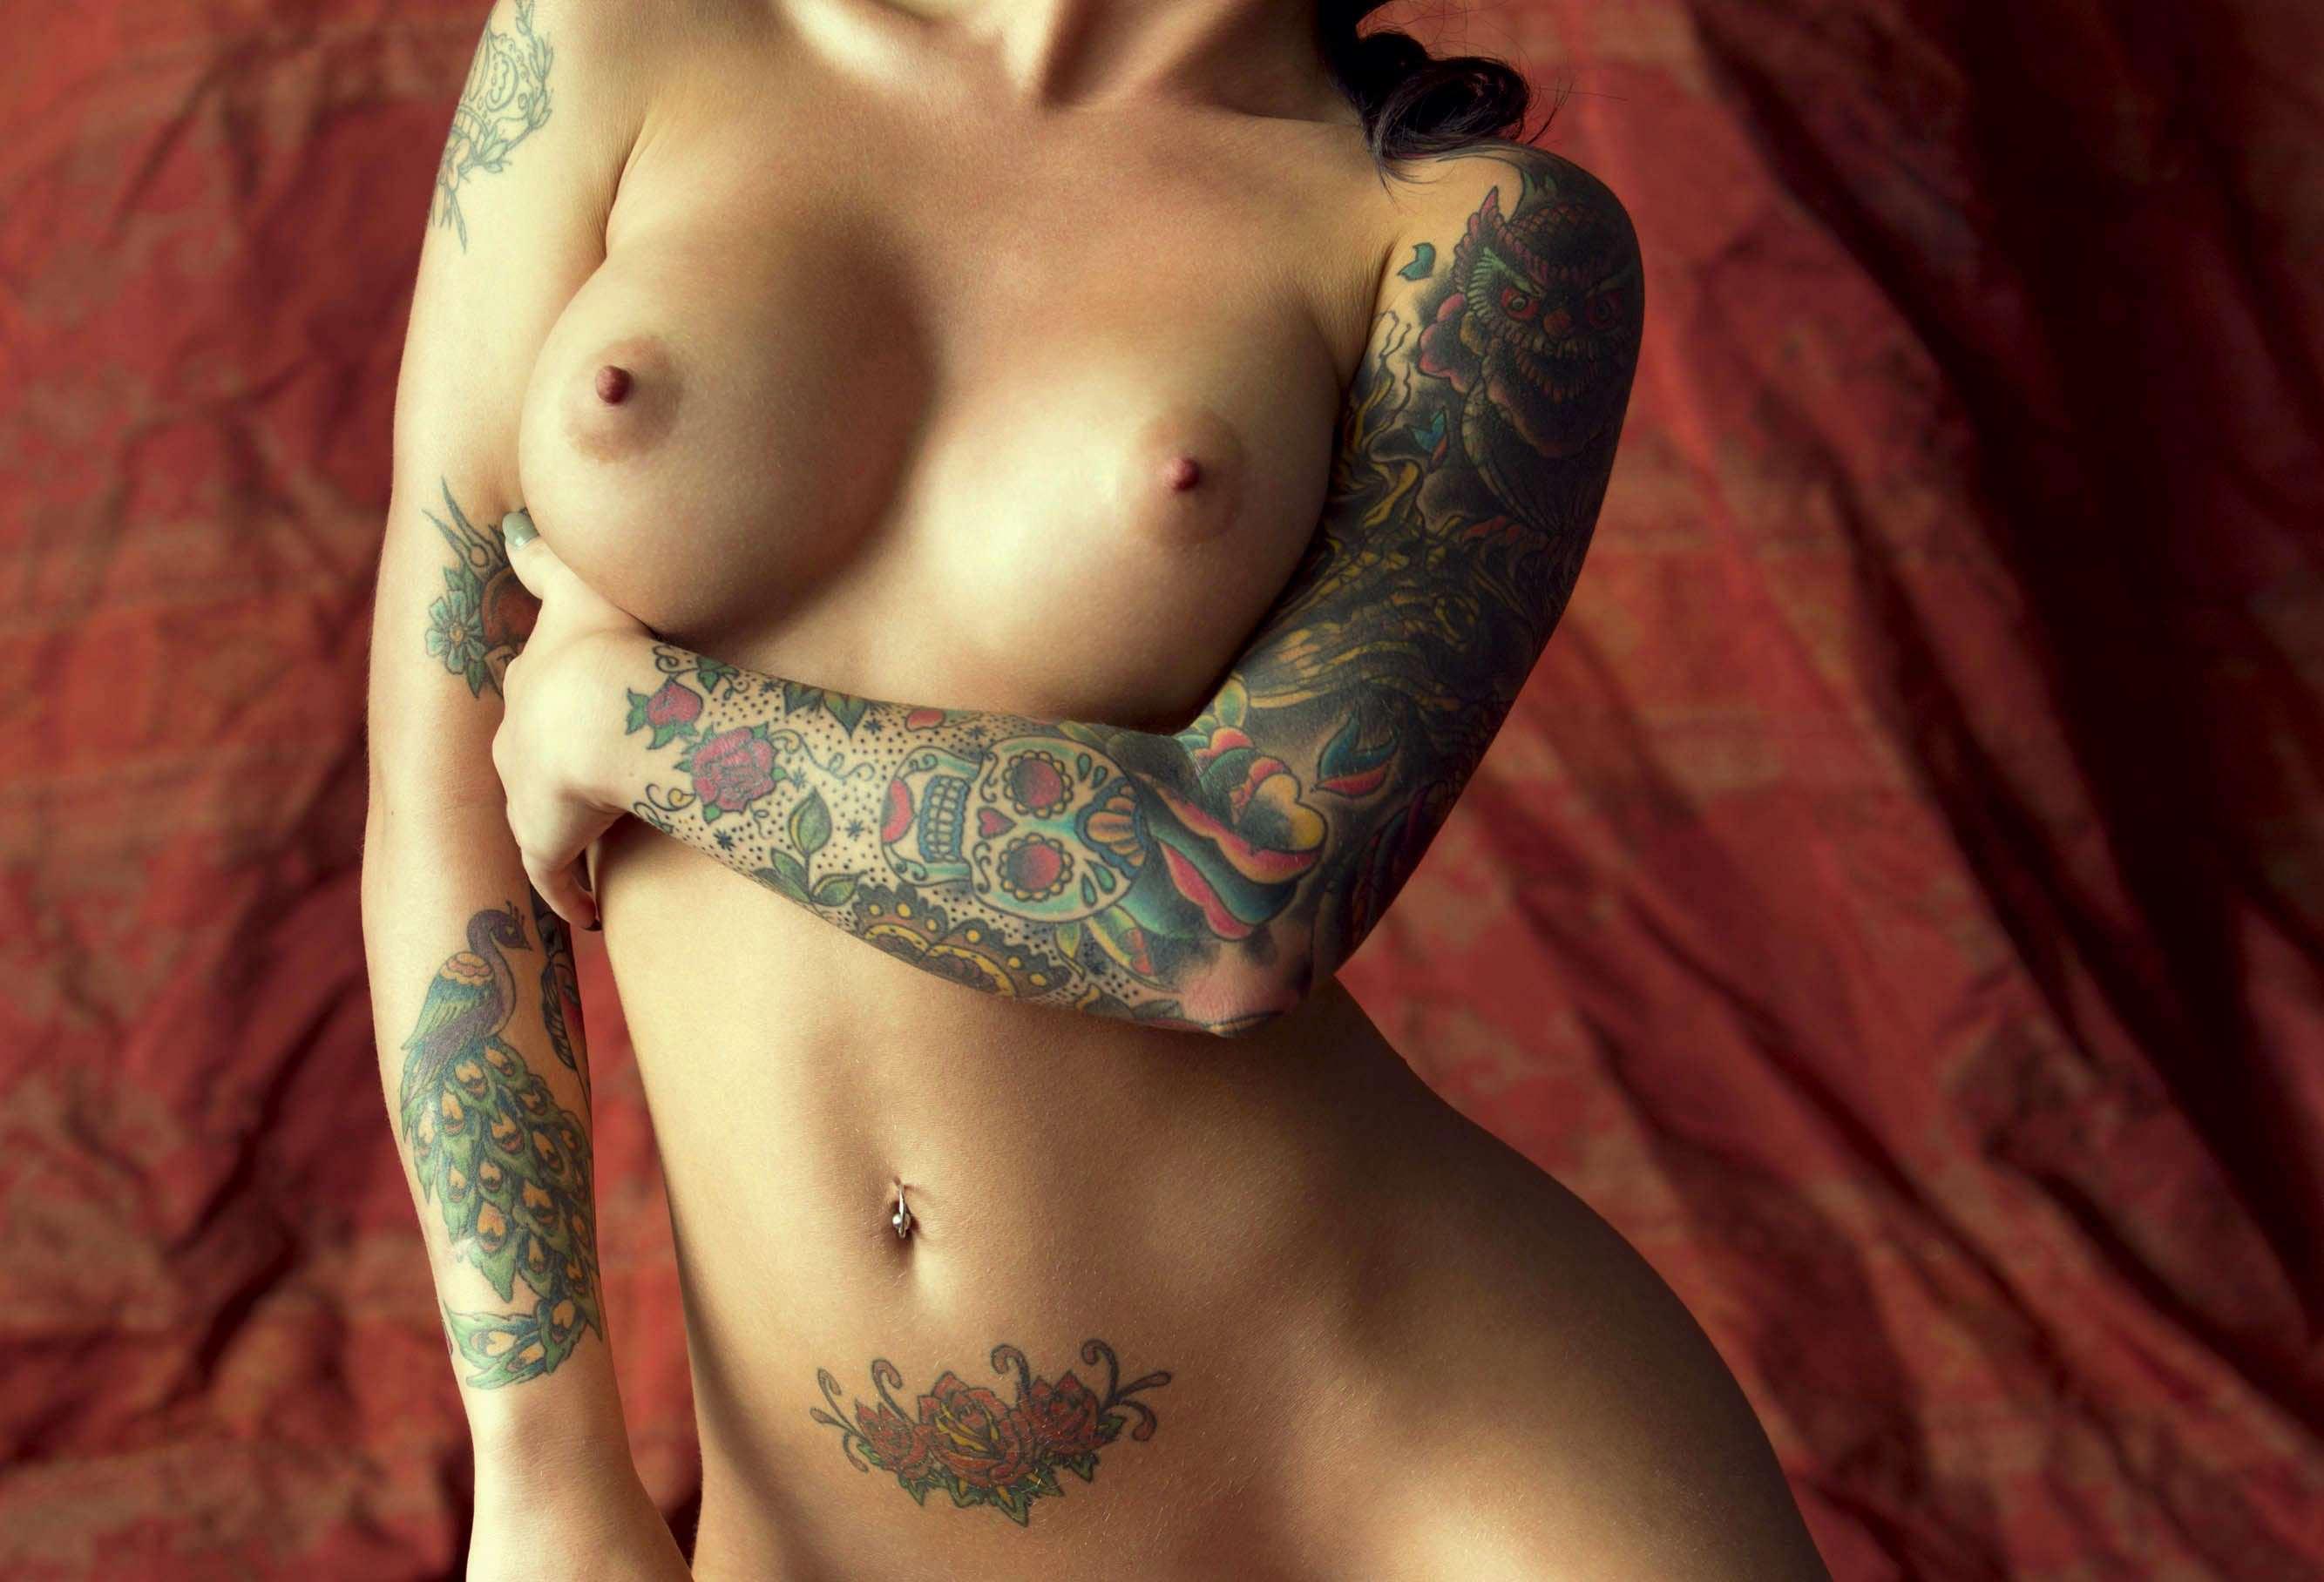 красивые девушки с татуировекими на теле секс фото рисунки